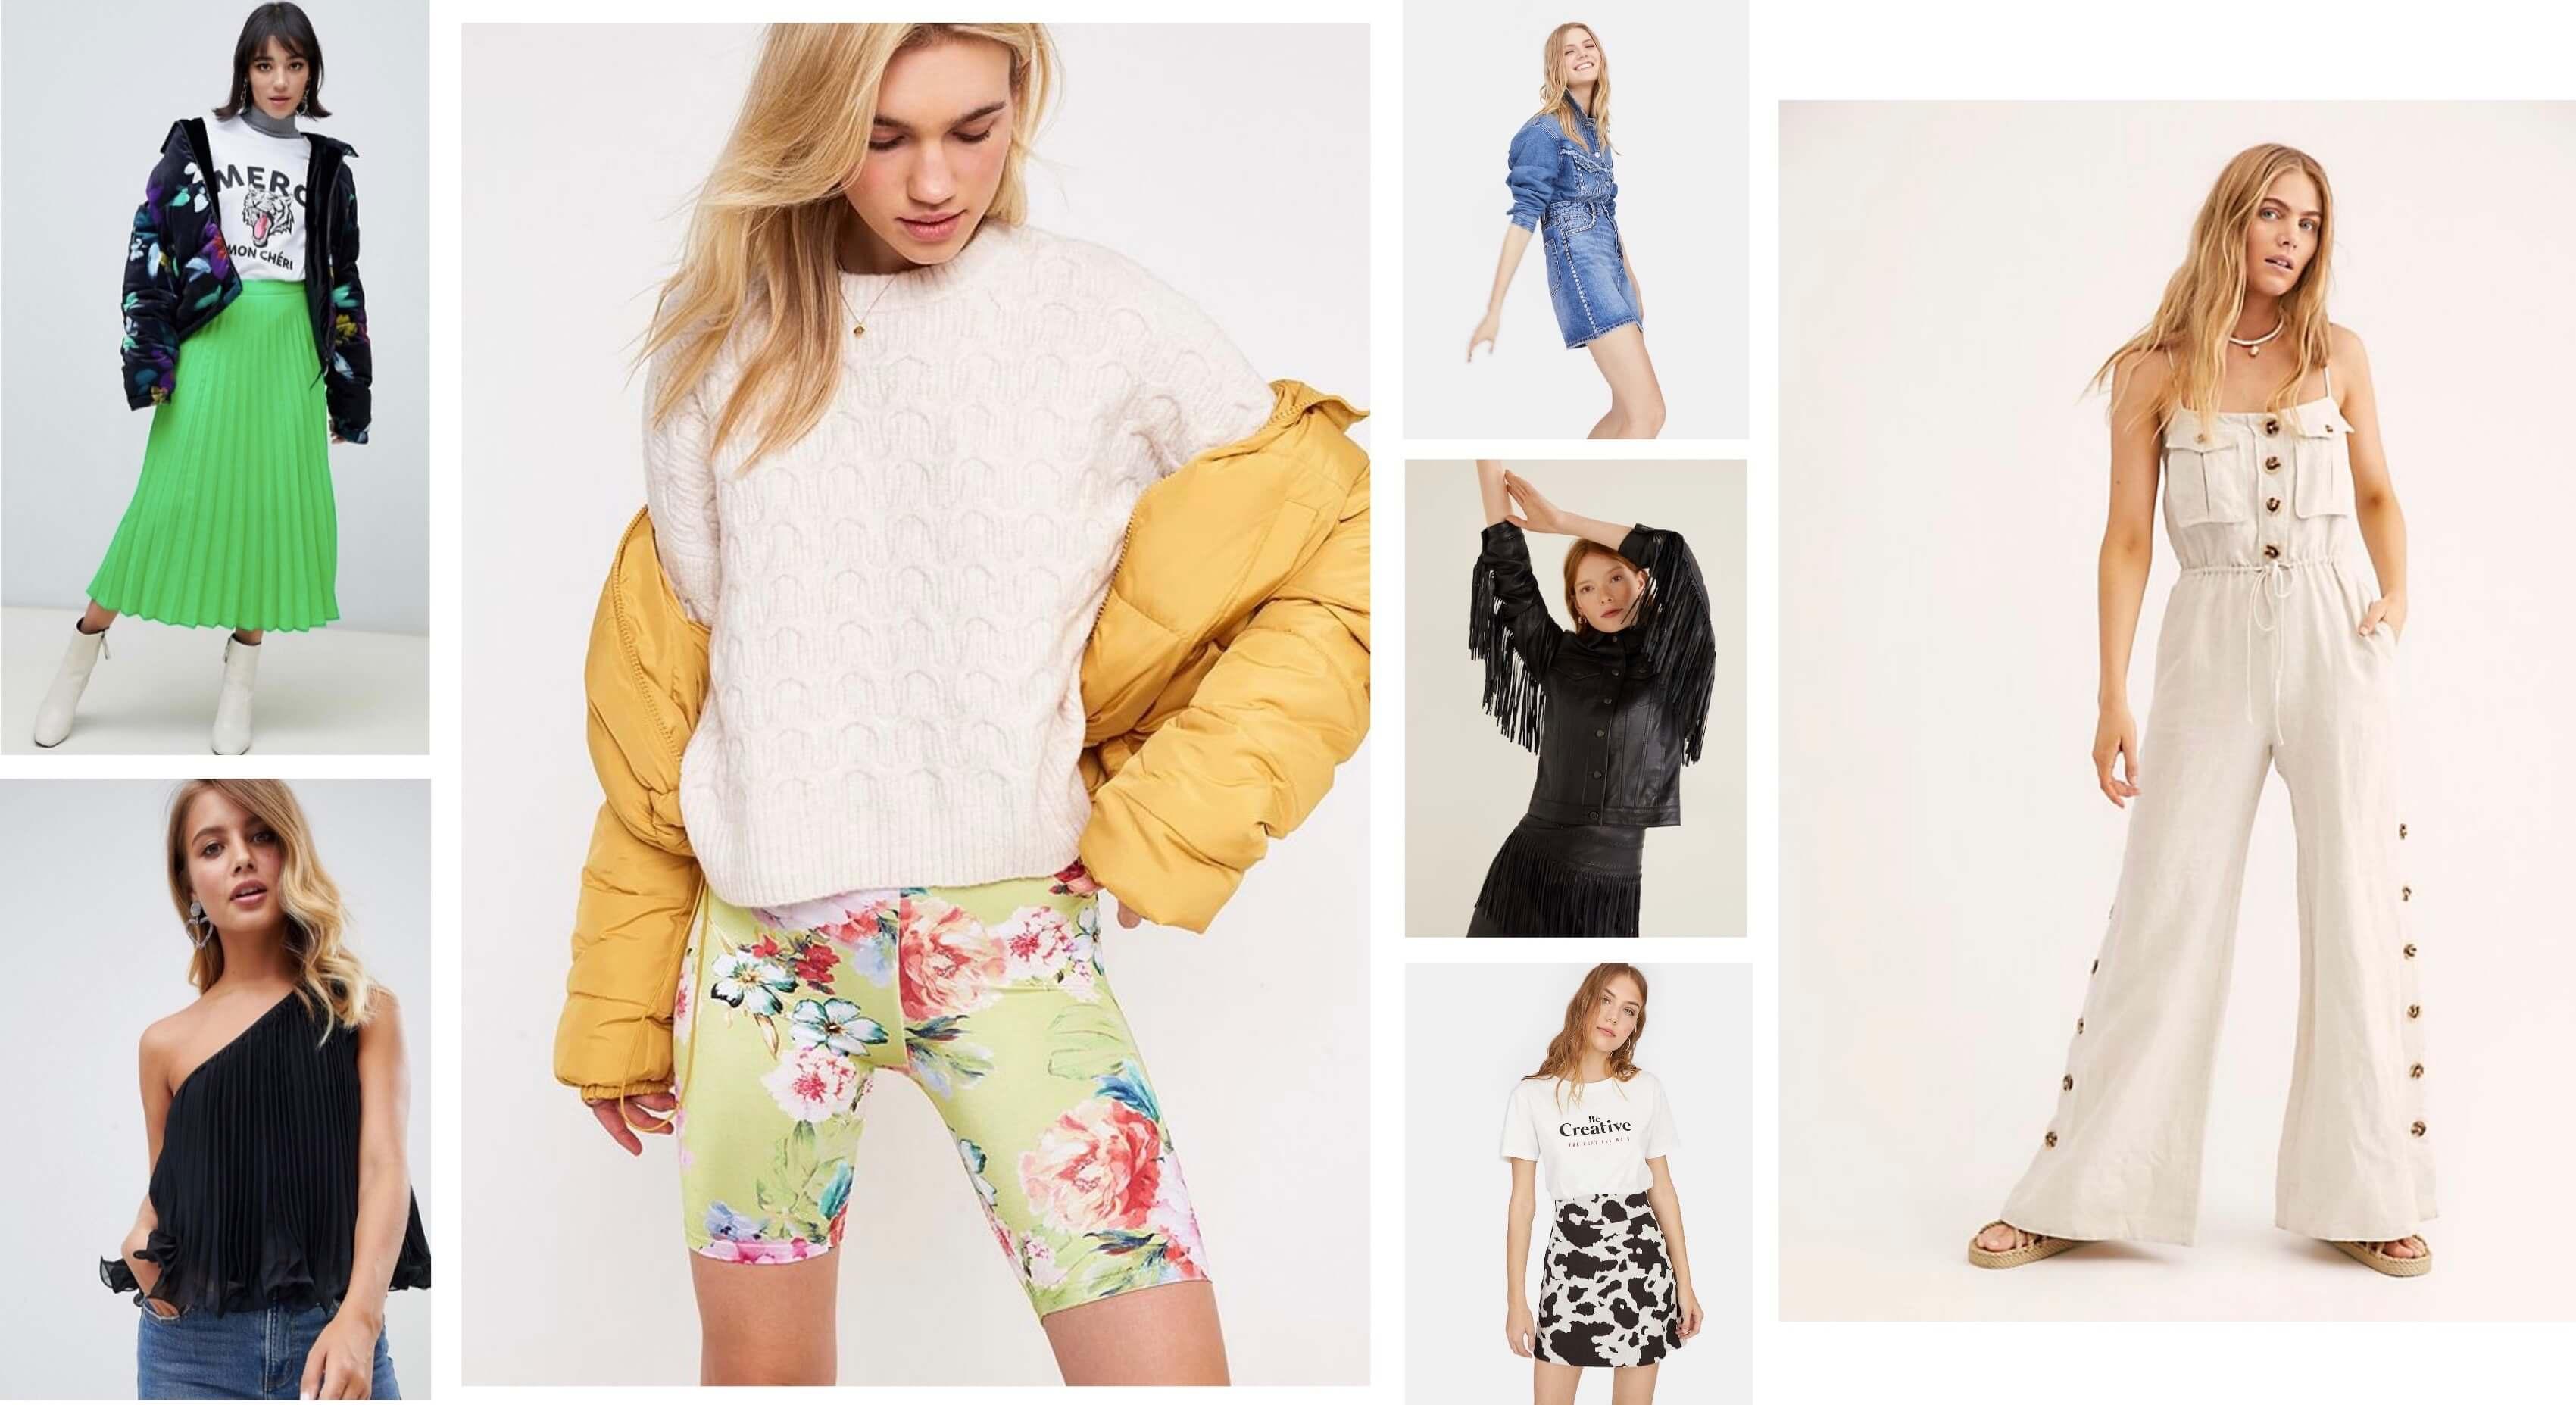 tendance mode printemps été 2019